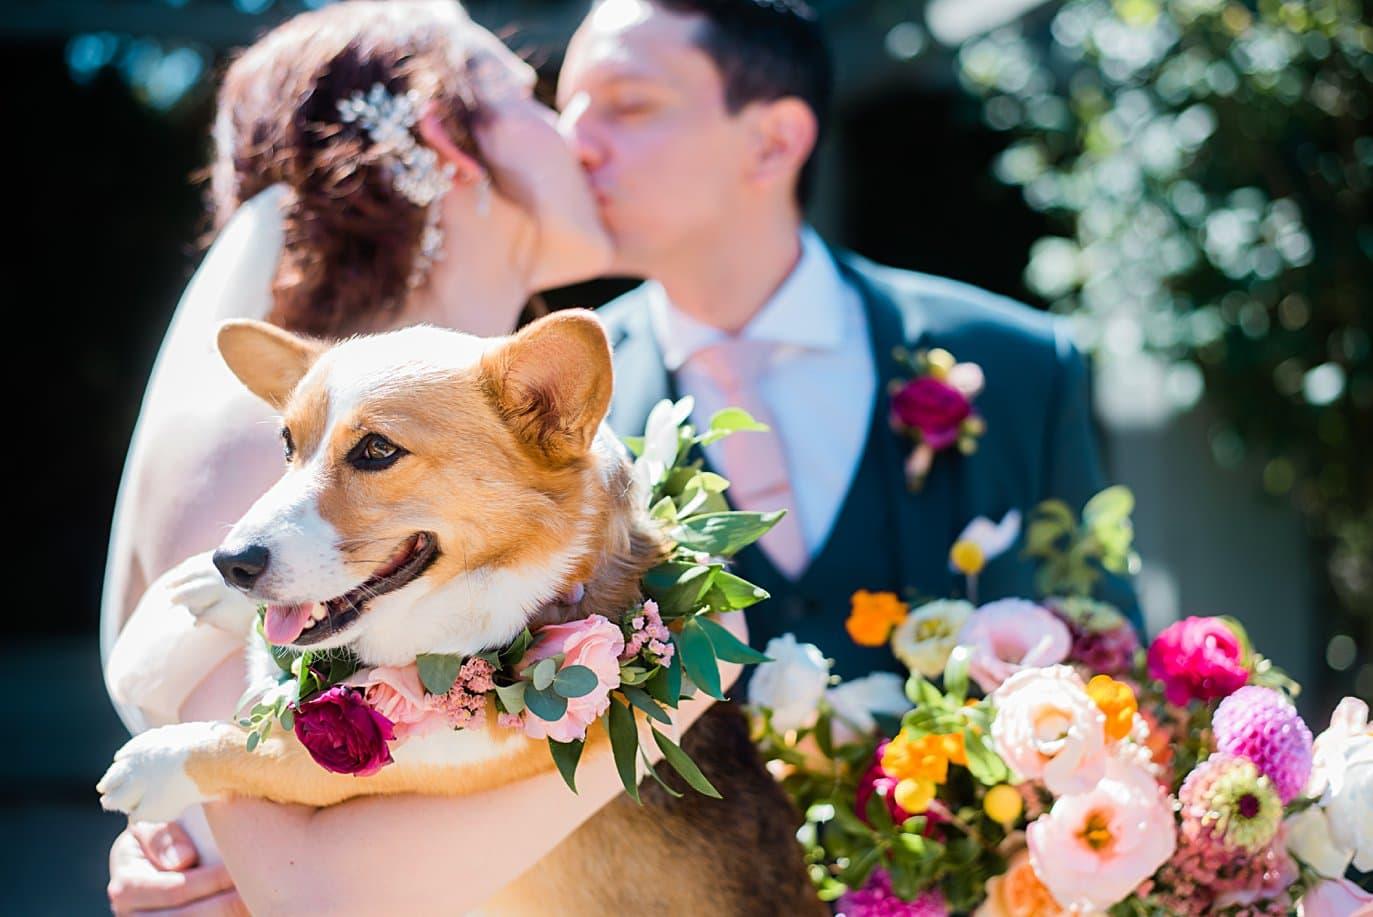 dog in flower collar on wedding day at Denver Botanic Gardens microwedding by Boulder wedding photographer Jennie Crate